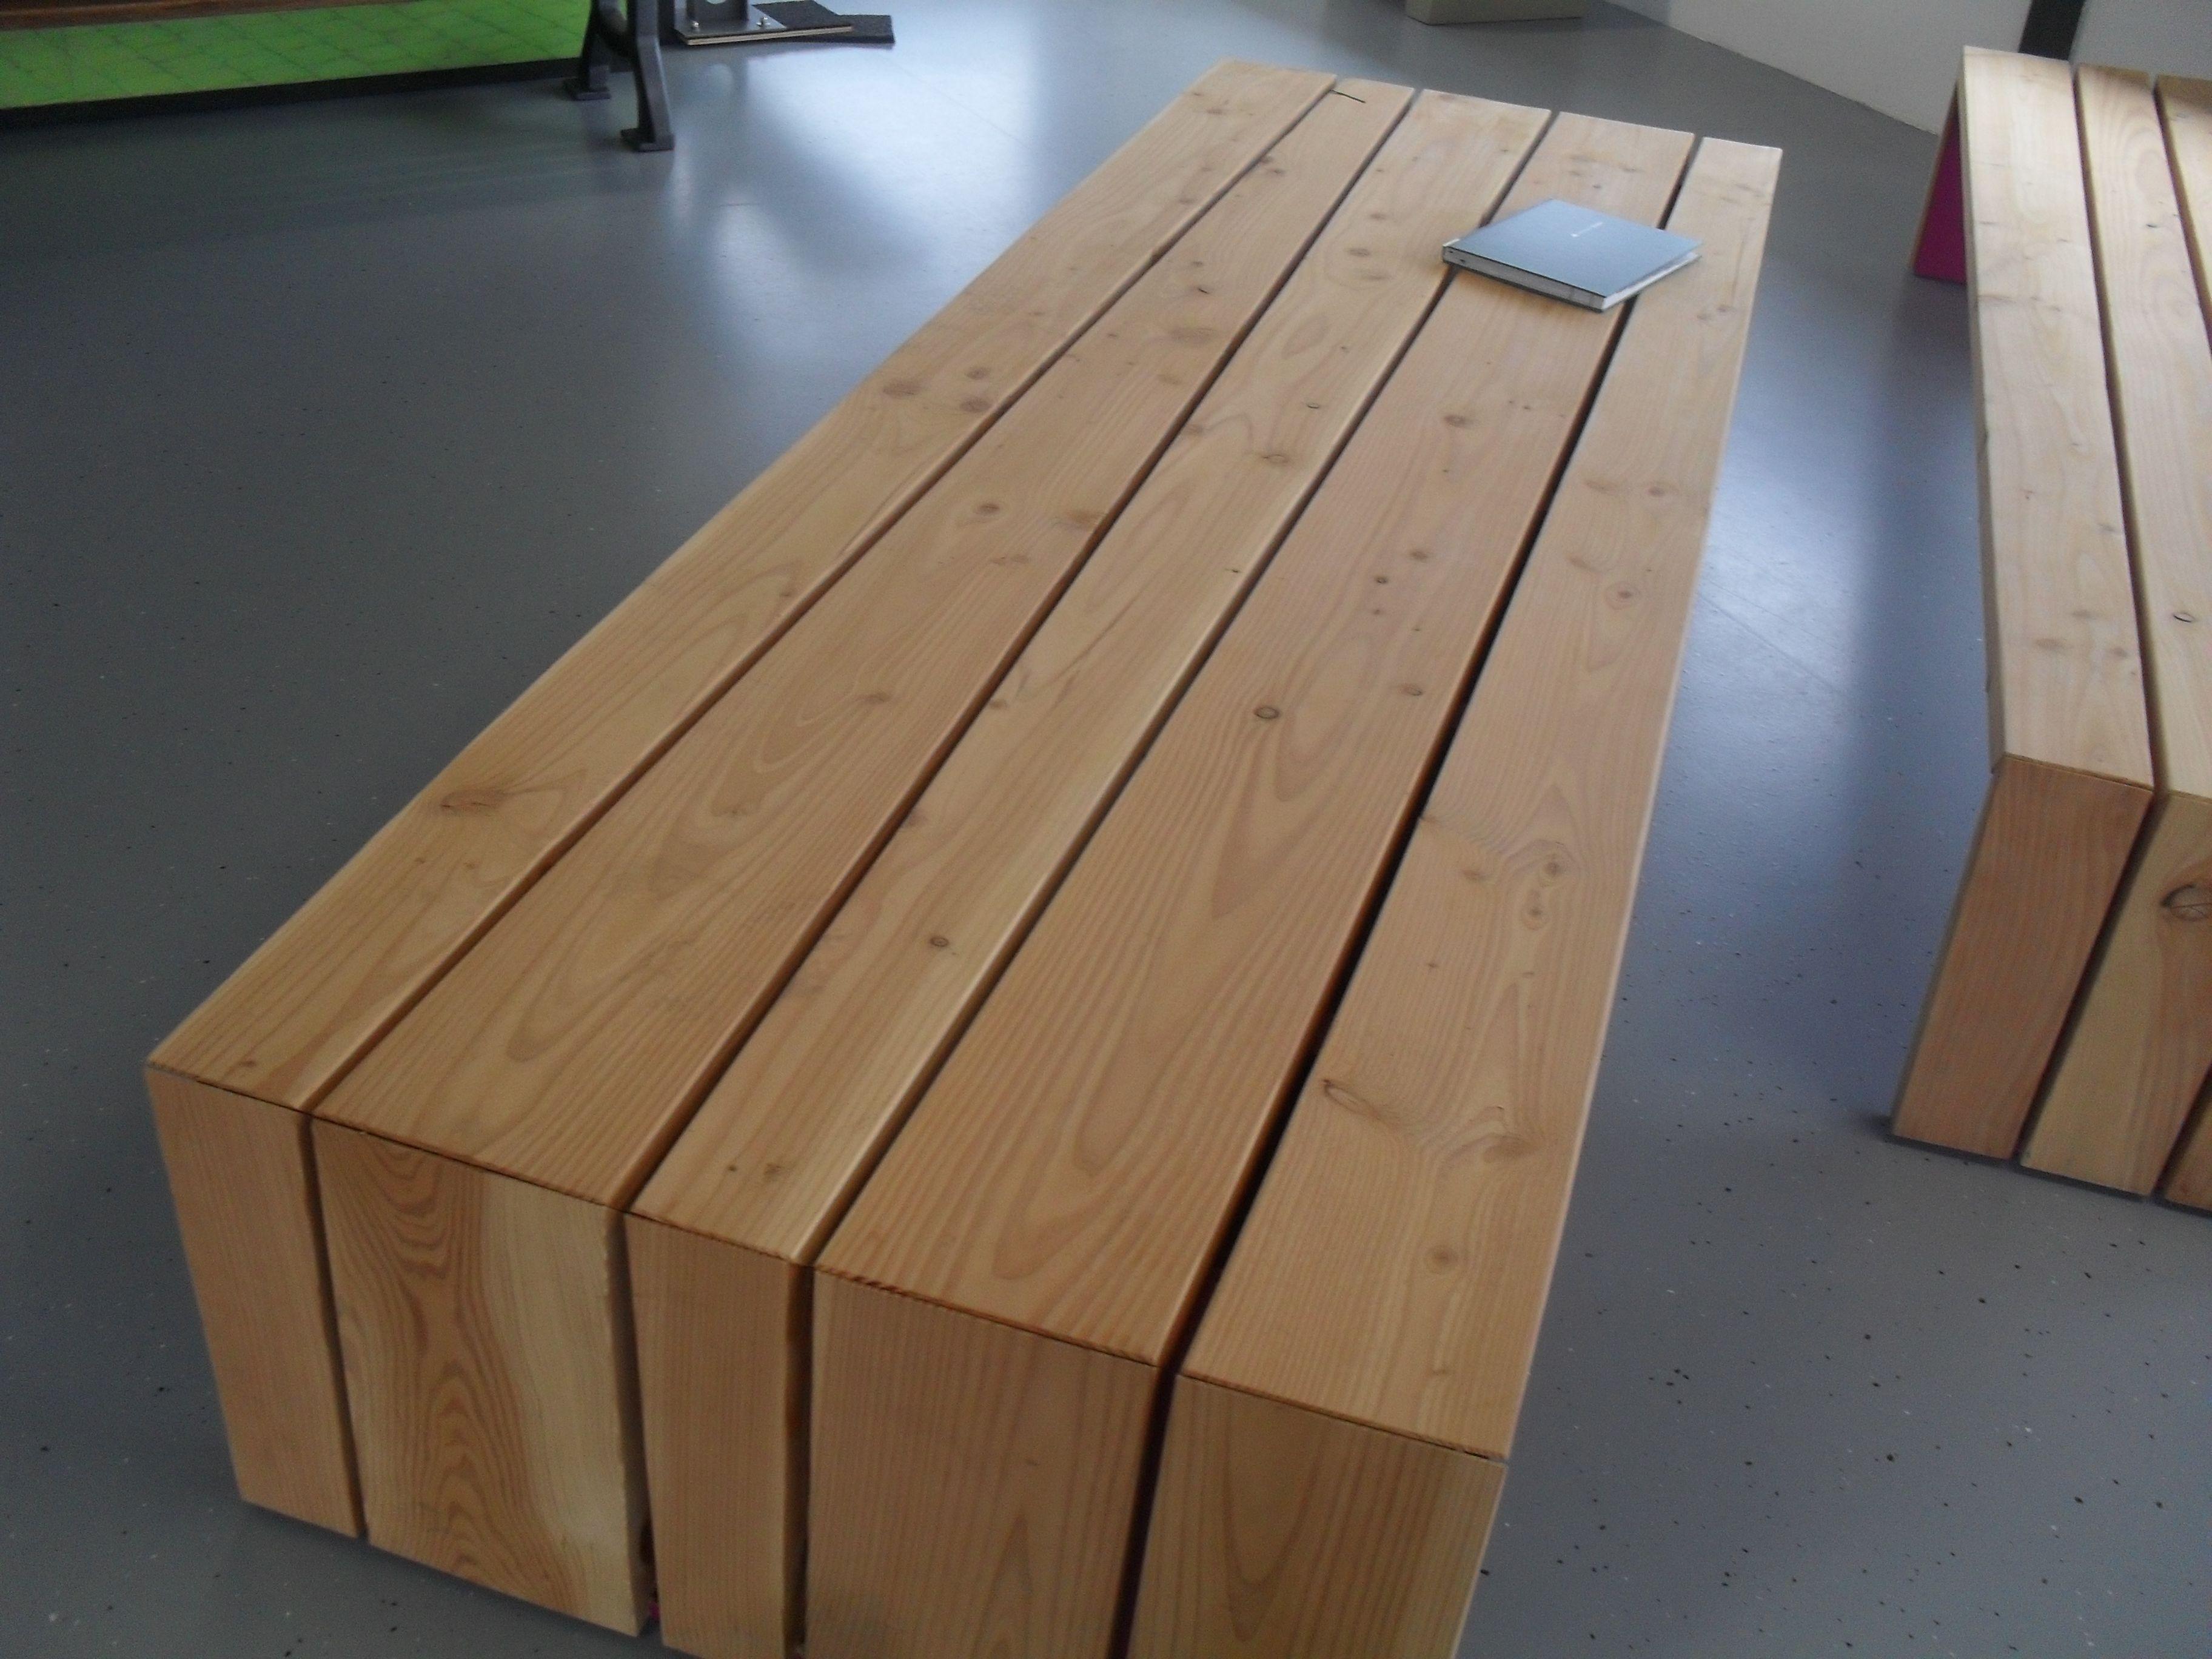 titel bankje hout balken bron lbw knubben plaats grijsen hout